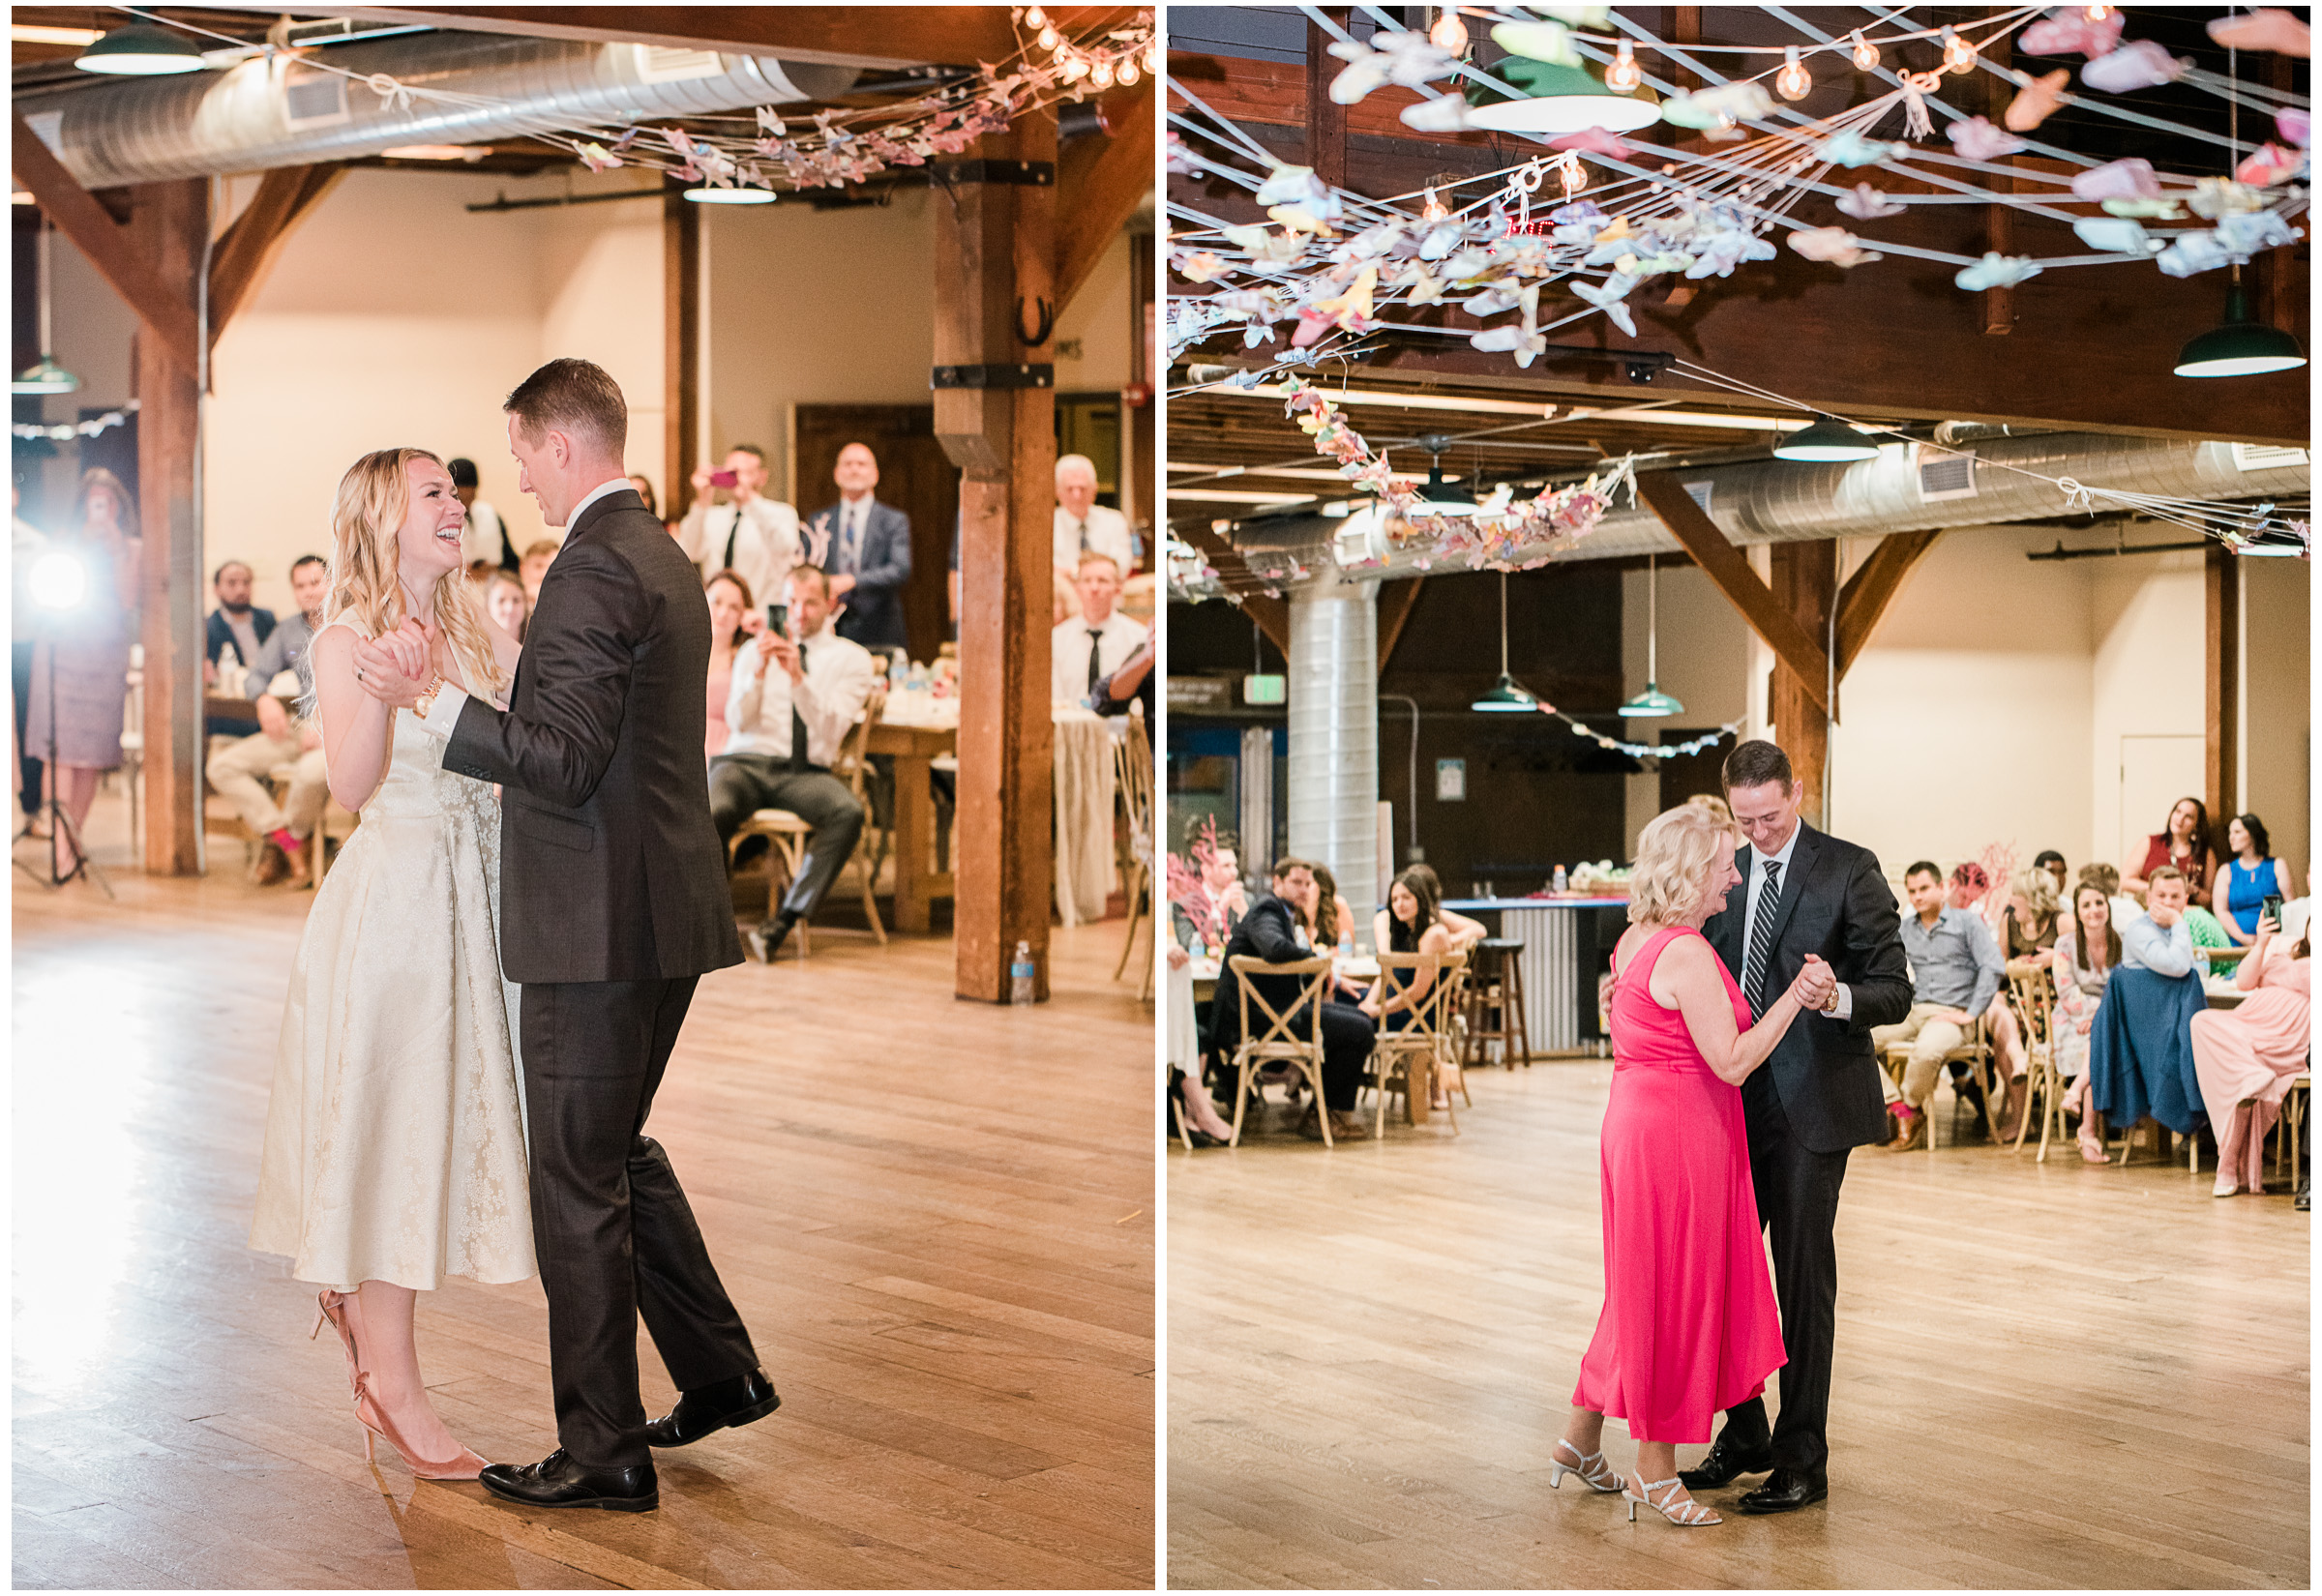 Loomis Wedding - Sacramento Photographer - Blue Goose - Justin Wilcox Photography - 17.jpg